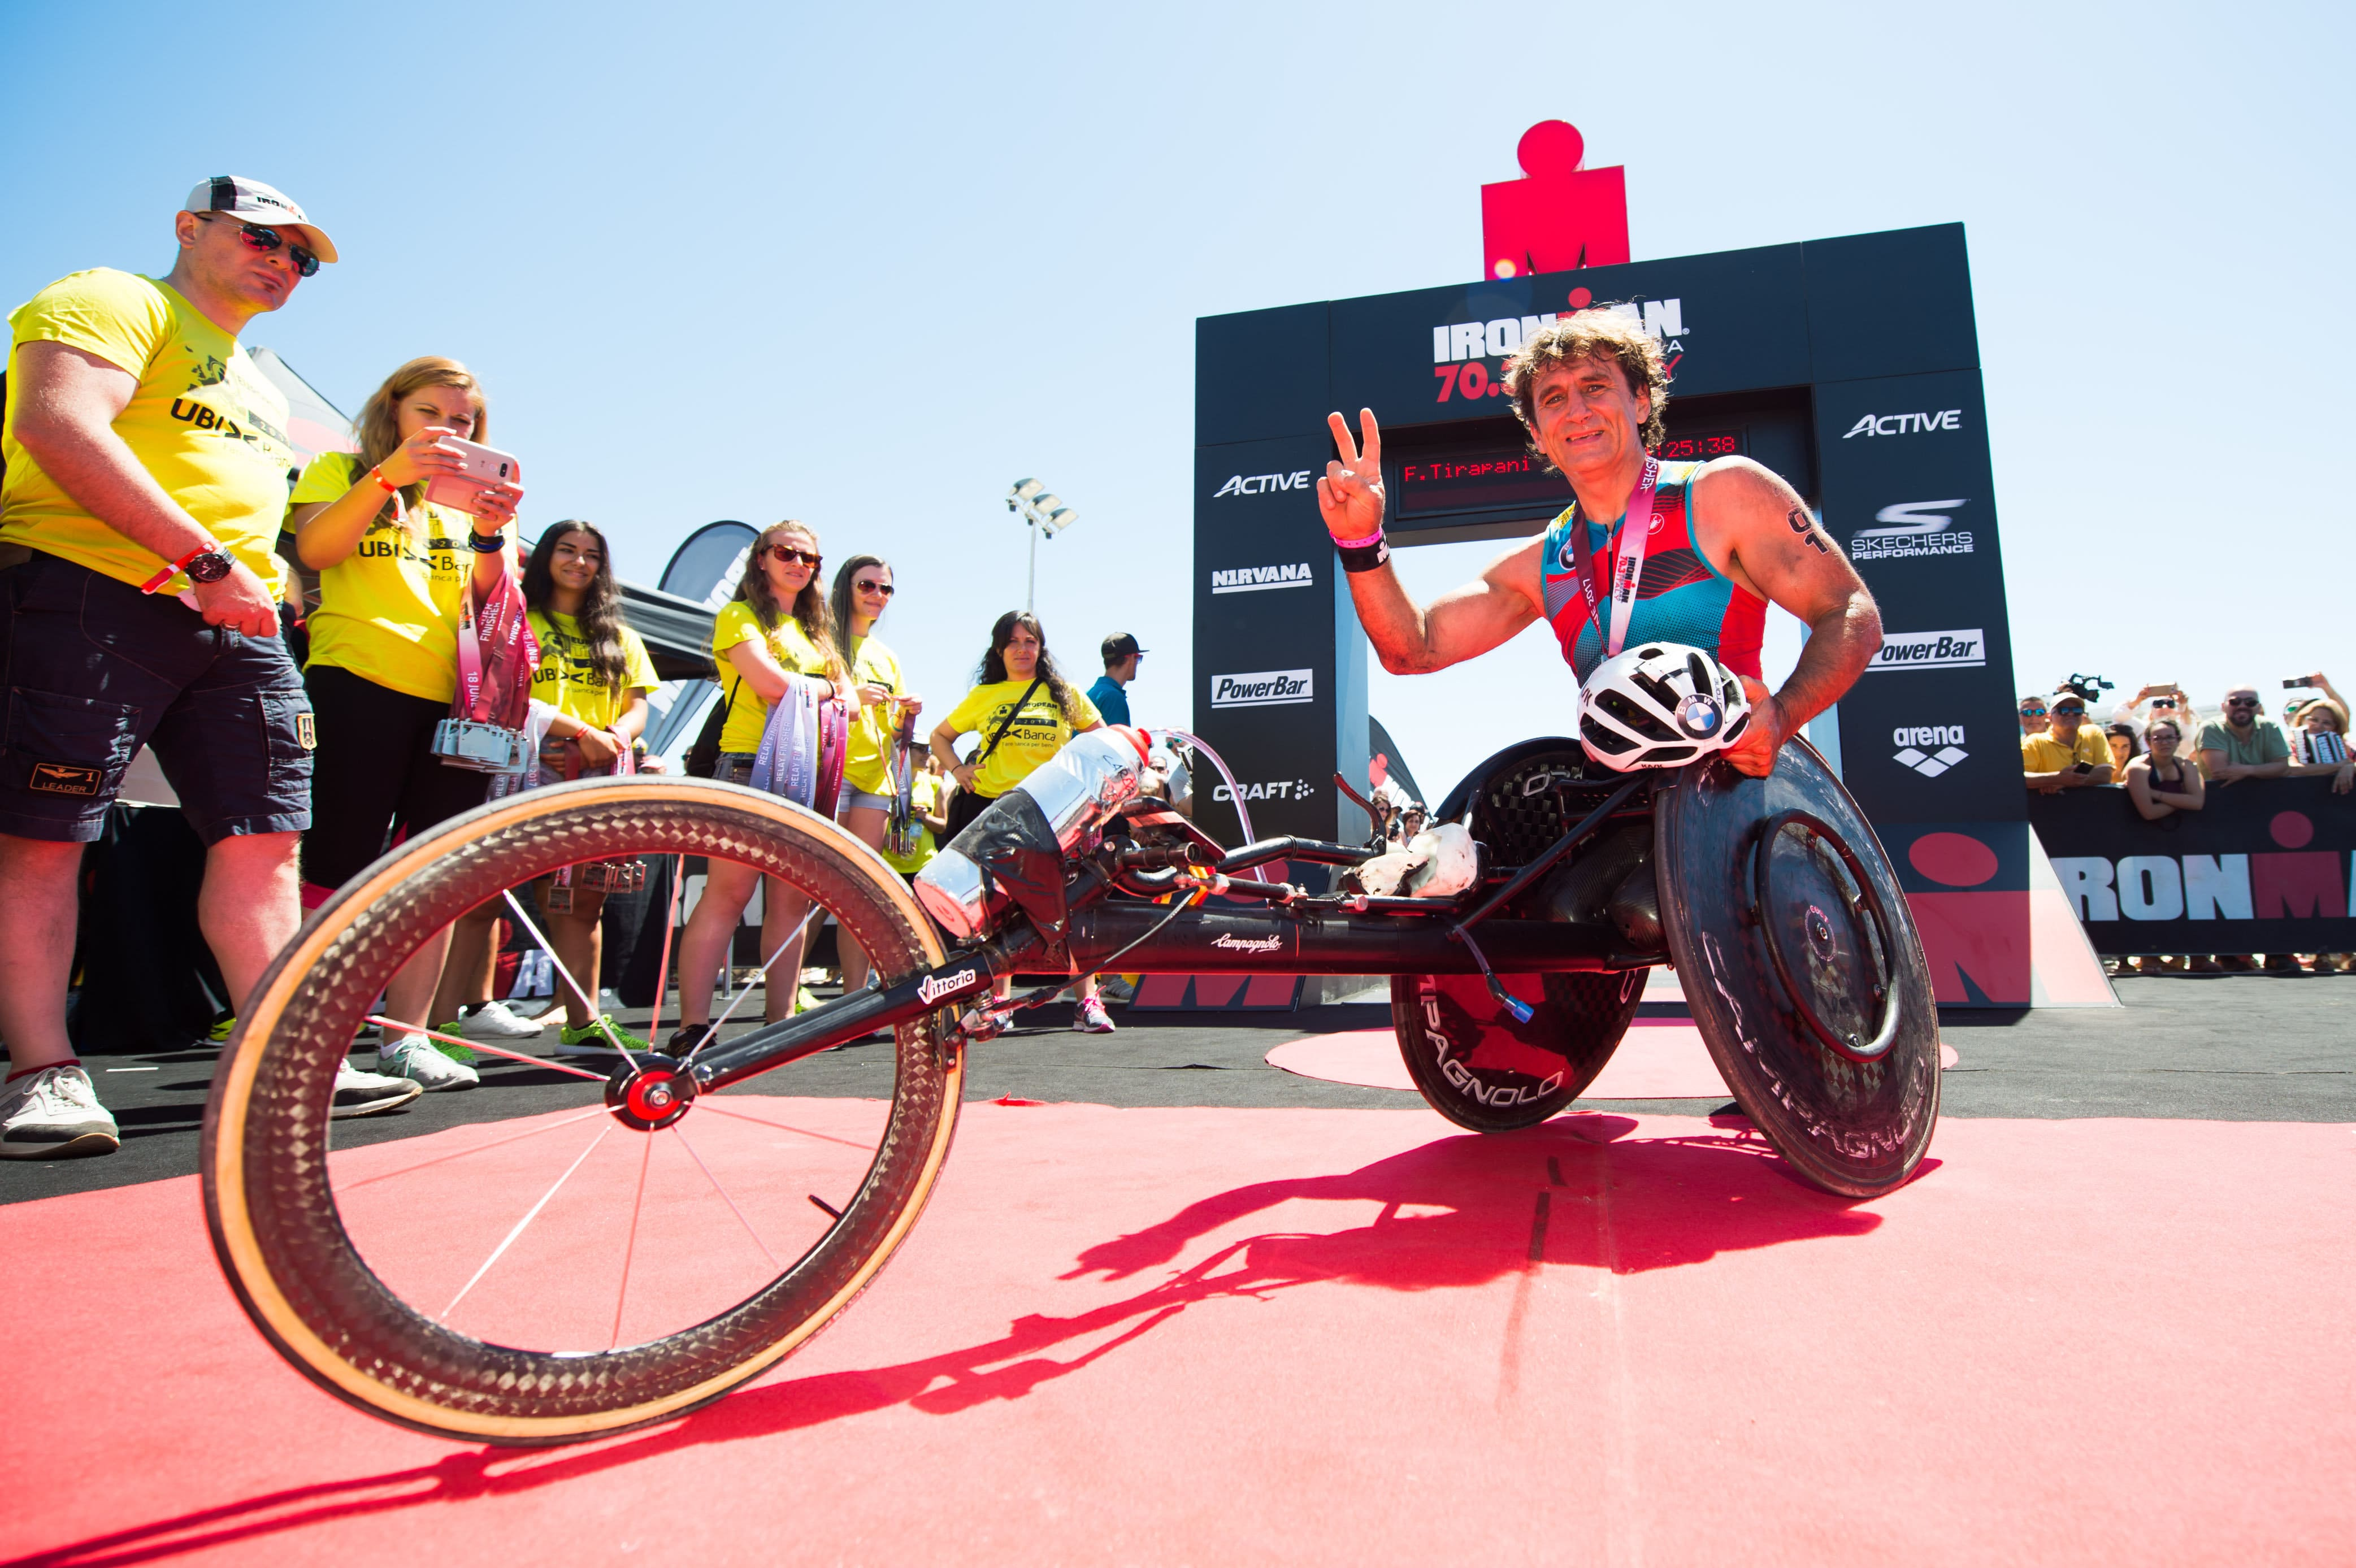 Alex Zanardi all'arrivo dell'Ironman 70.3 Italy 2017 a Pescara (Foto ©AlexCaparros/Getty Images for IRONMAN)